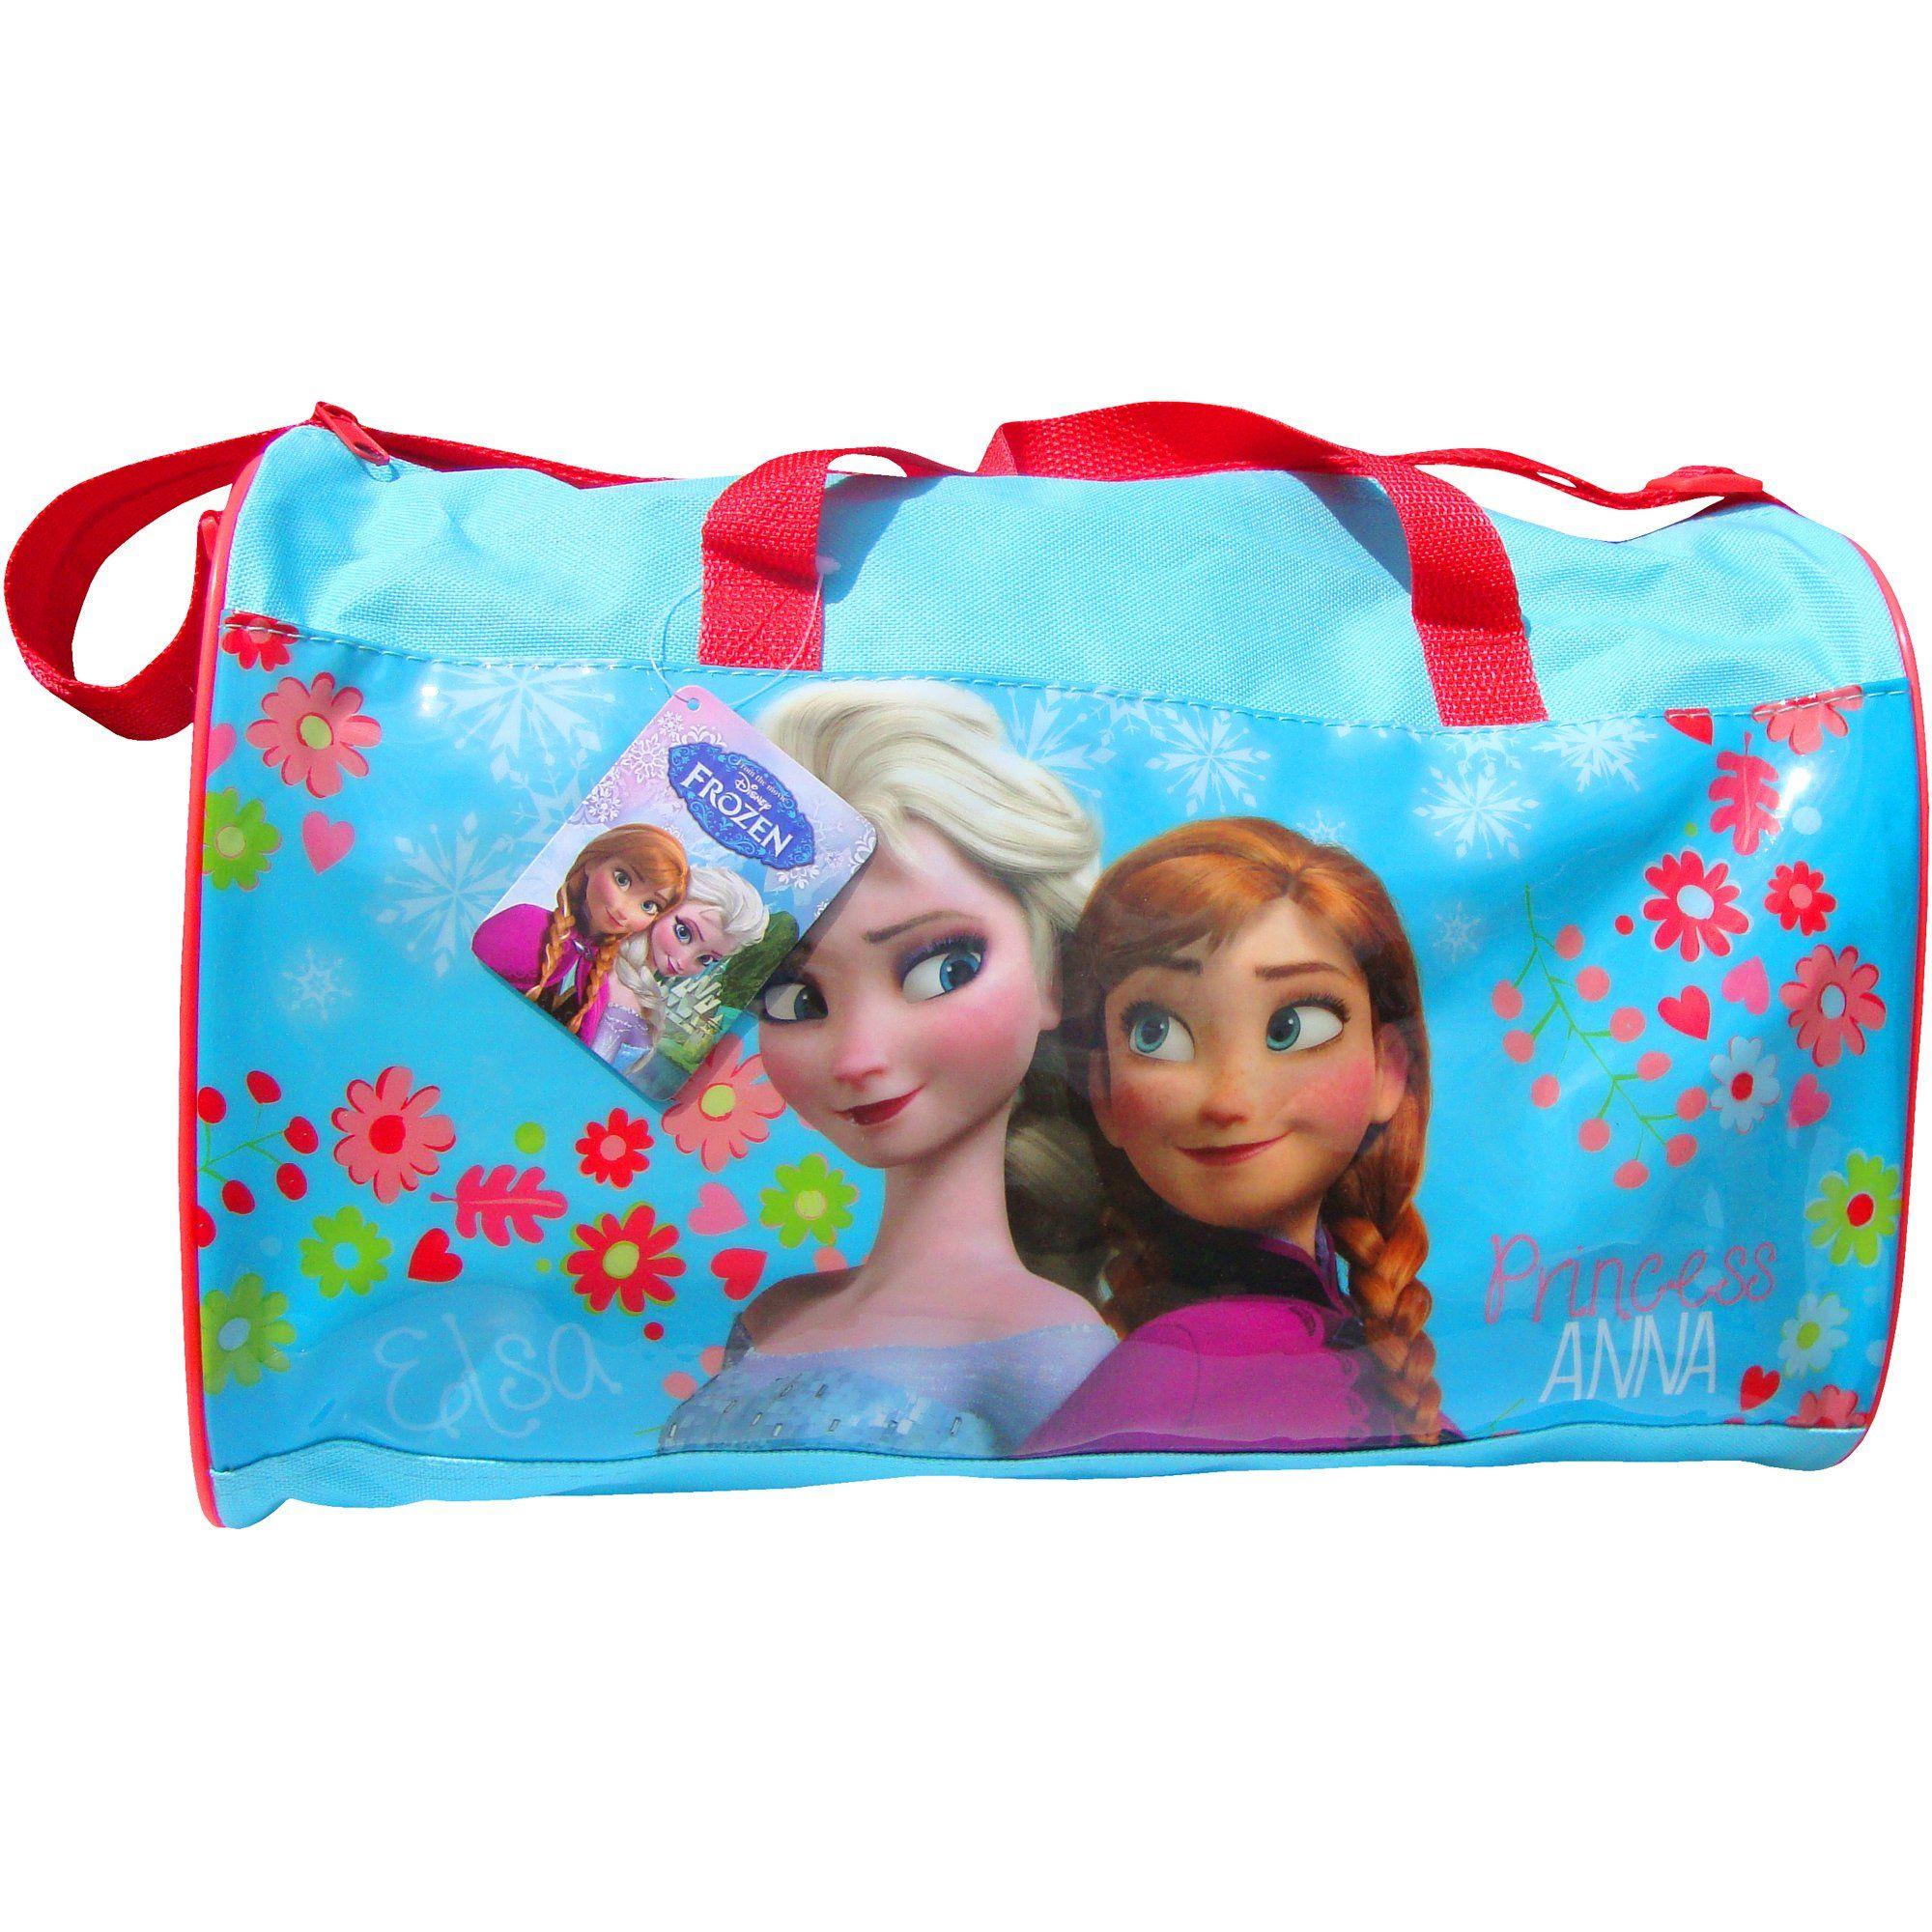 Disney frozen elsa anna sleepover holdall travel bag